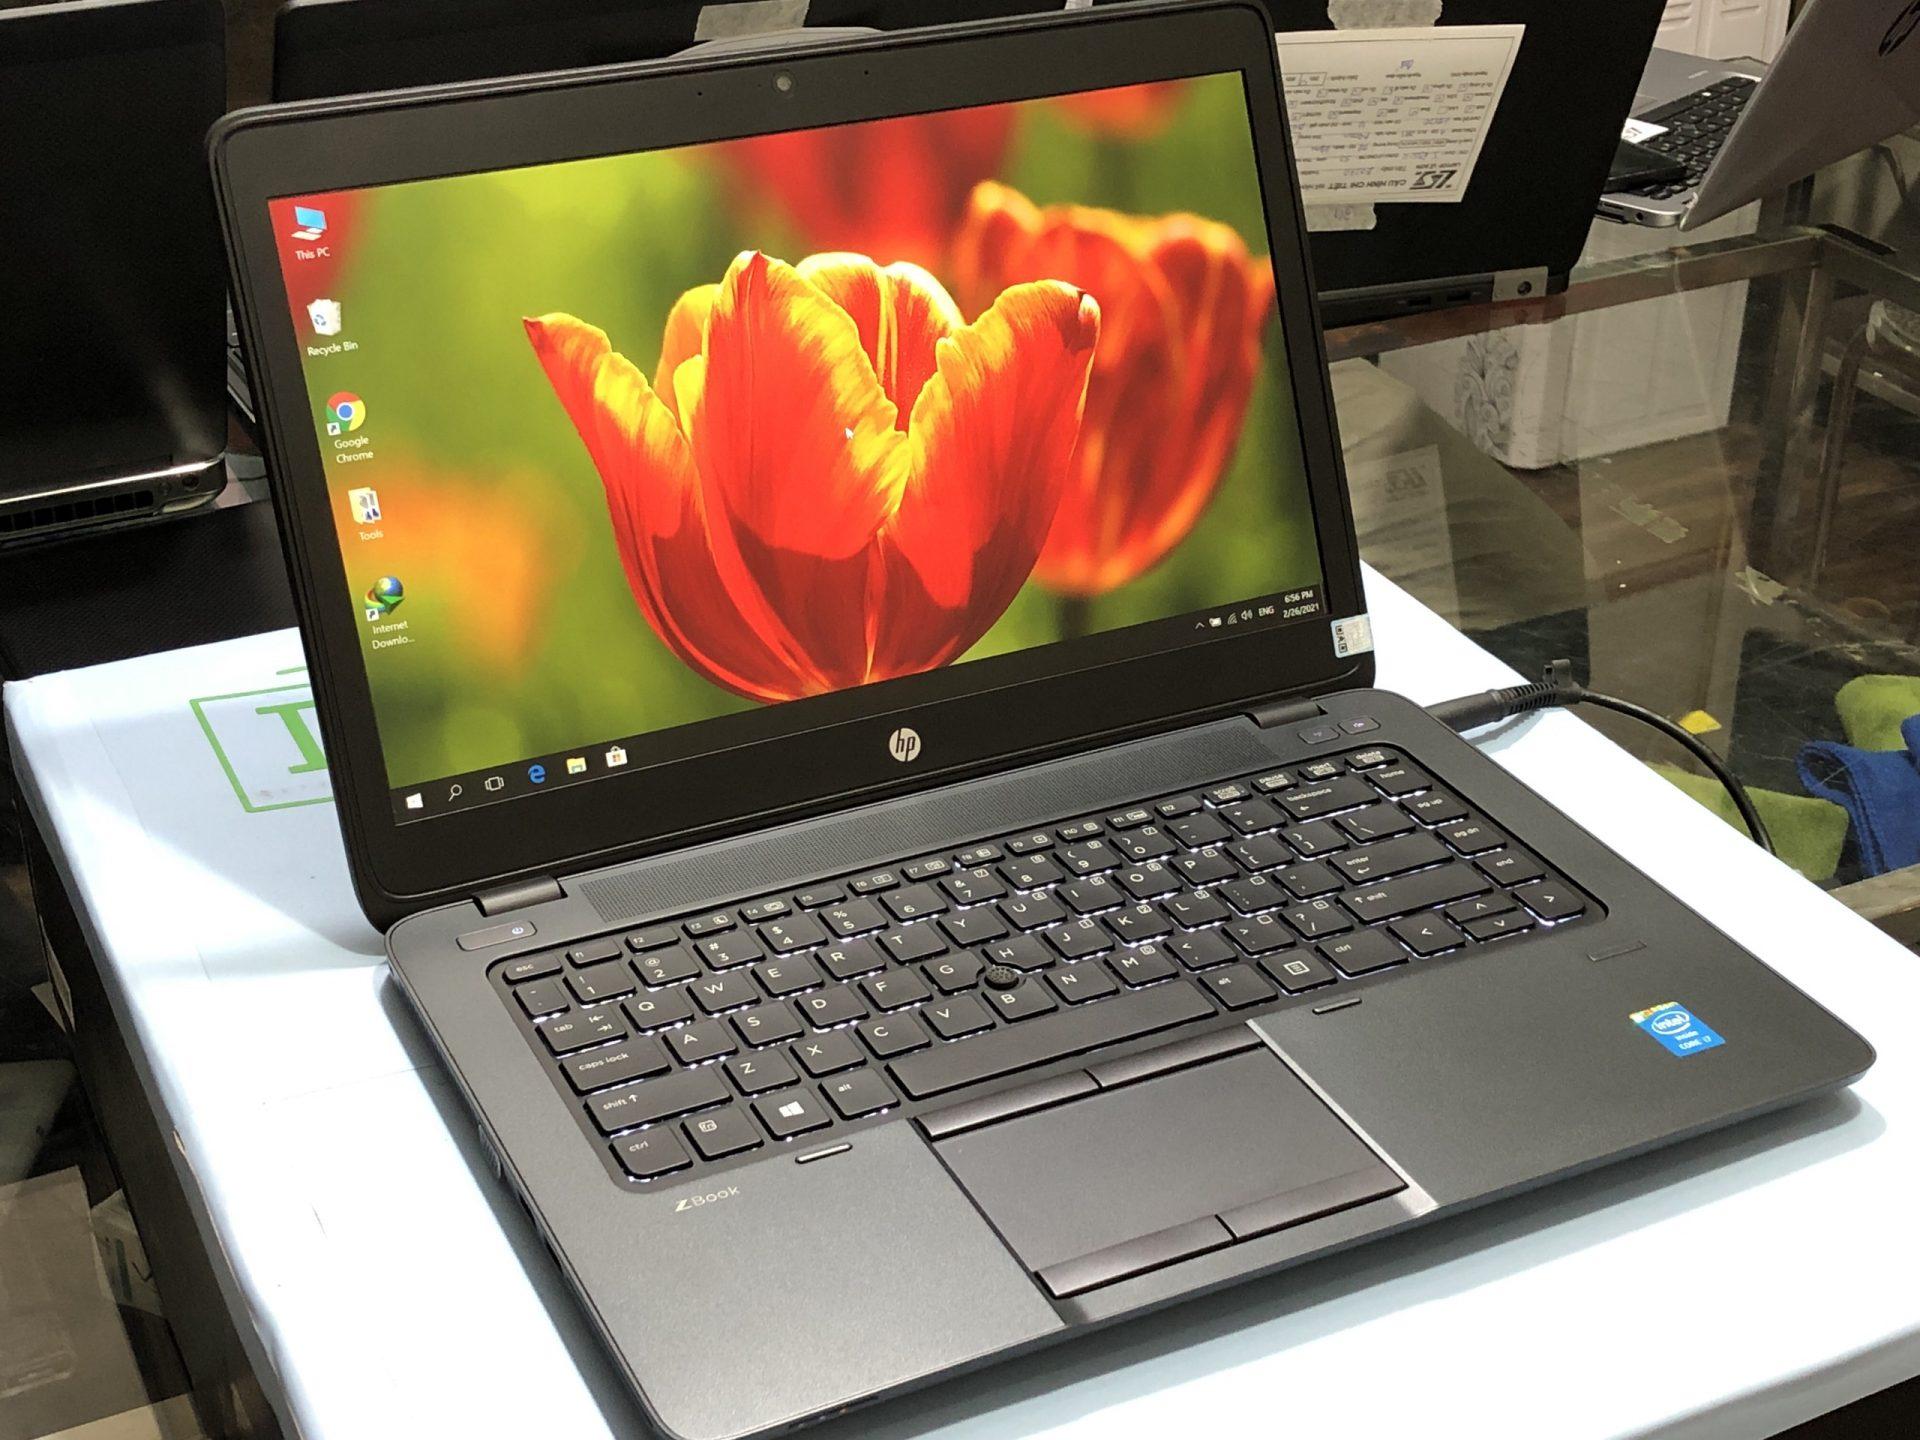 z2350713748884 63f0e0f81b8b3917b93354a45ee8aa41 Laptop Lê Sơn